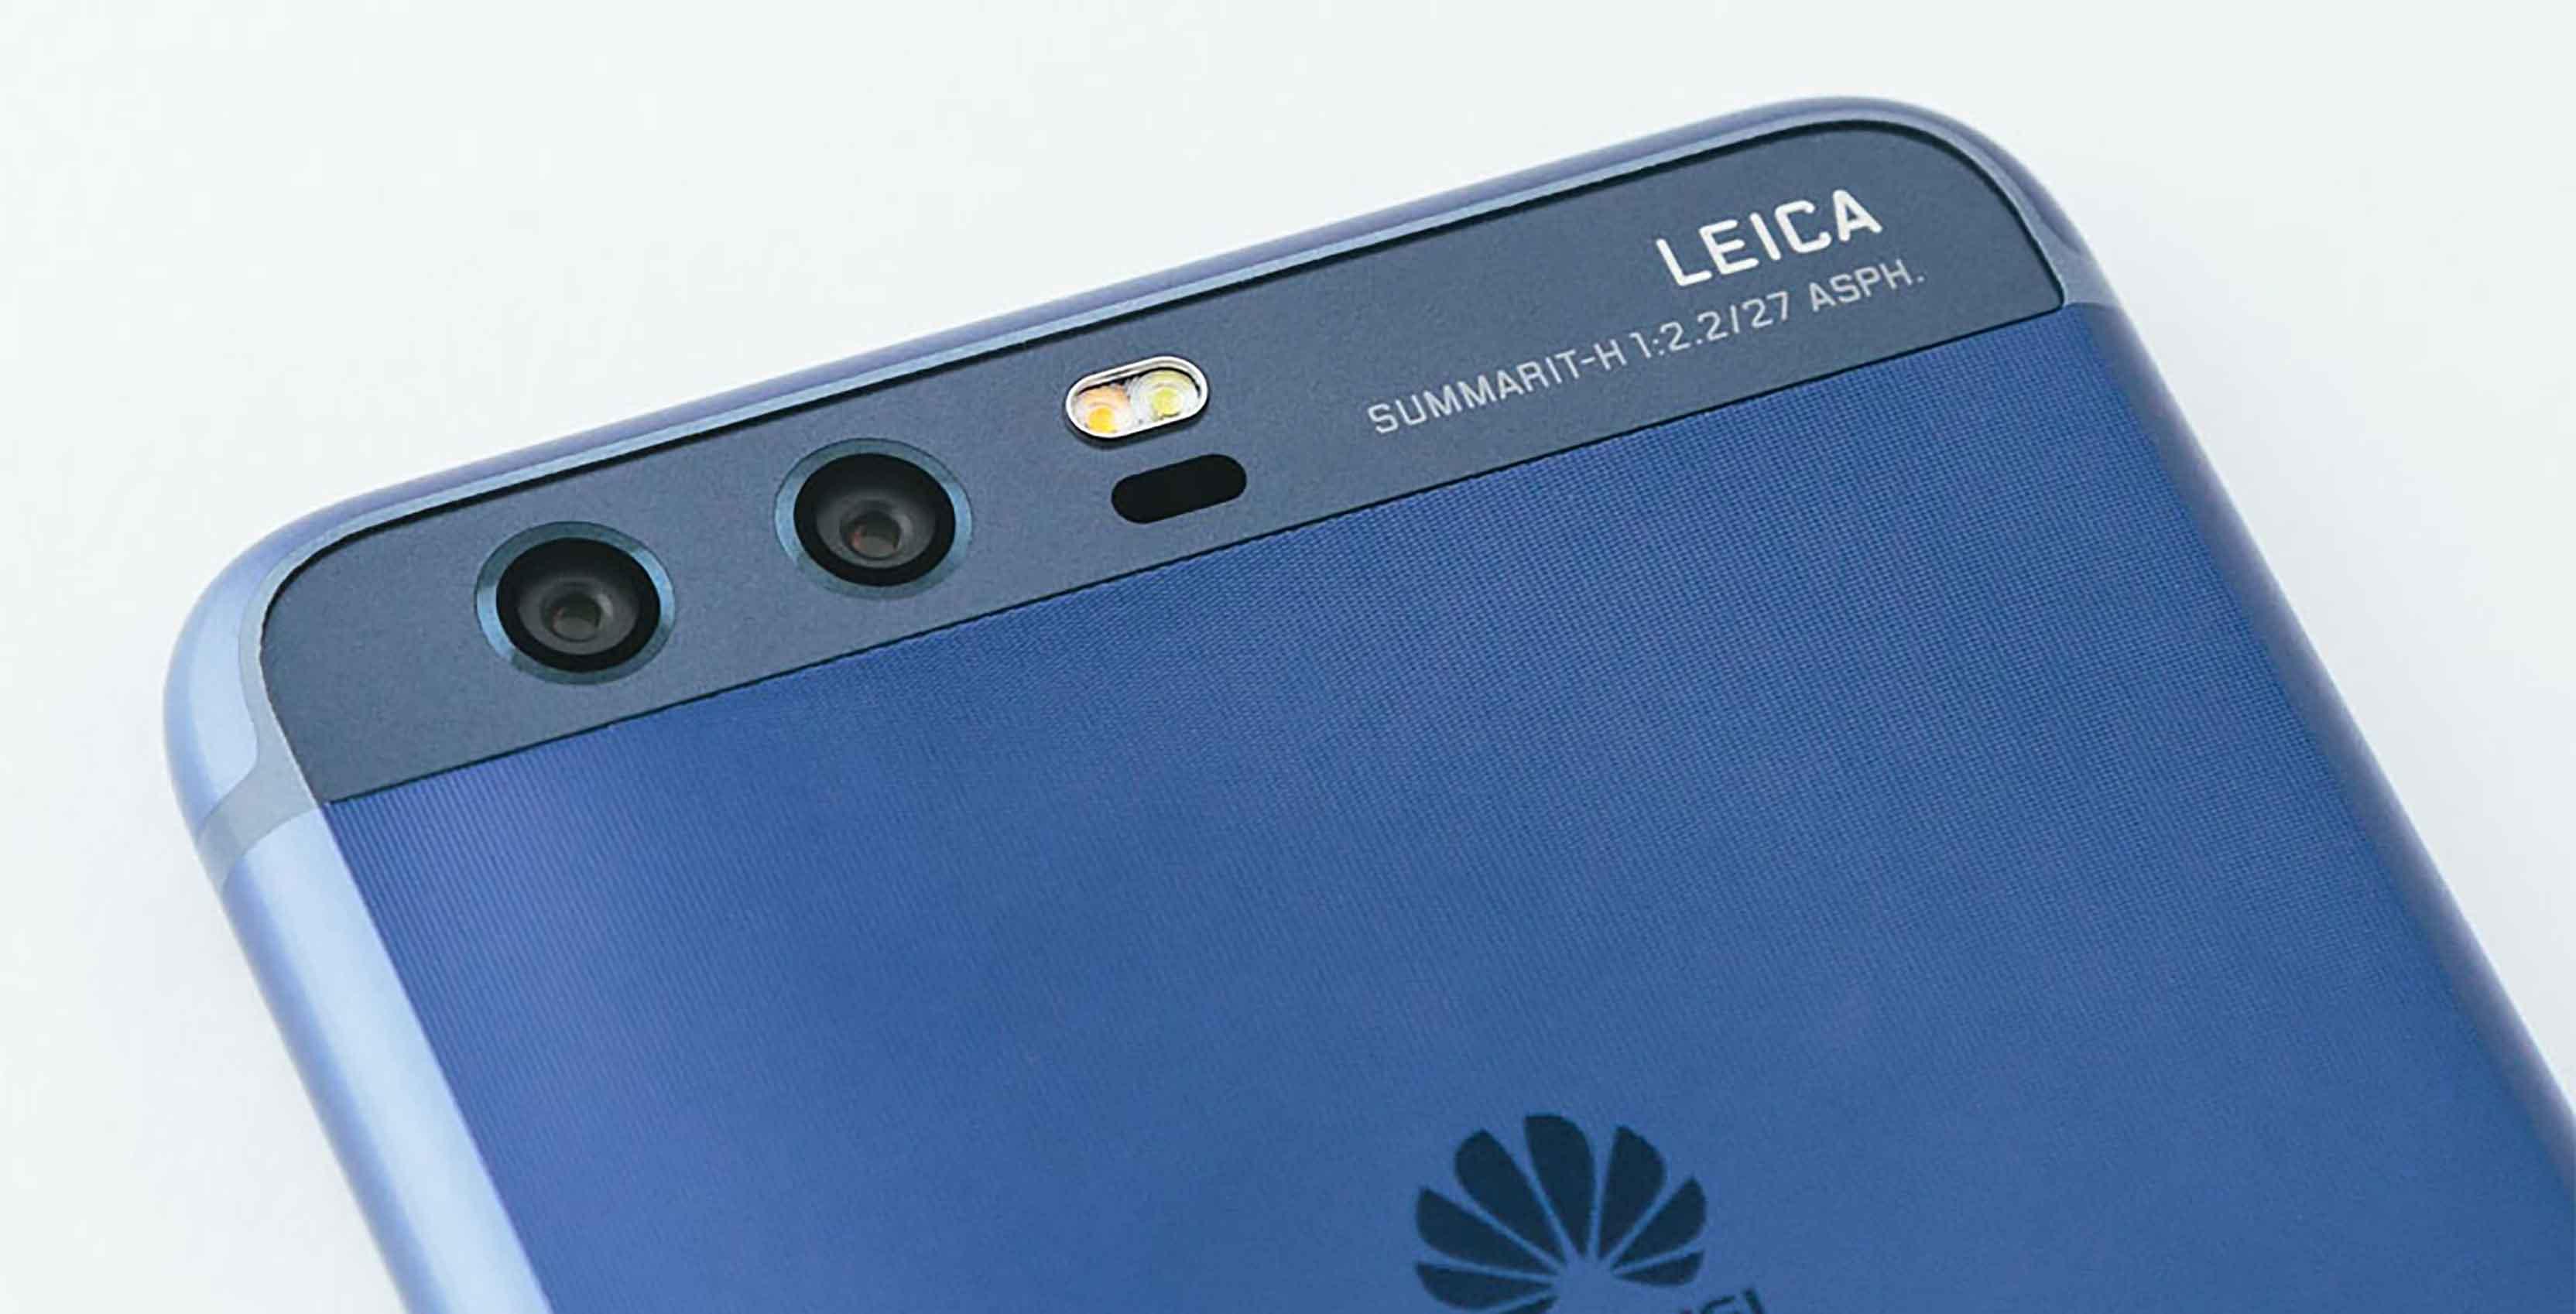 Blue huawei p10 back camera - Huawei P10 DxOMark